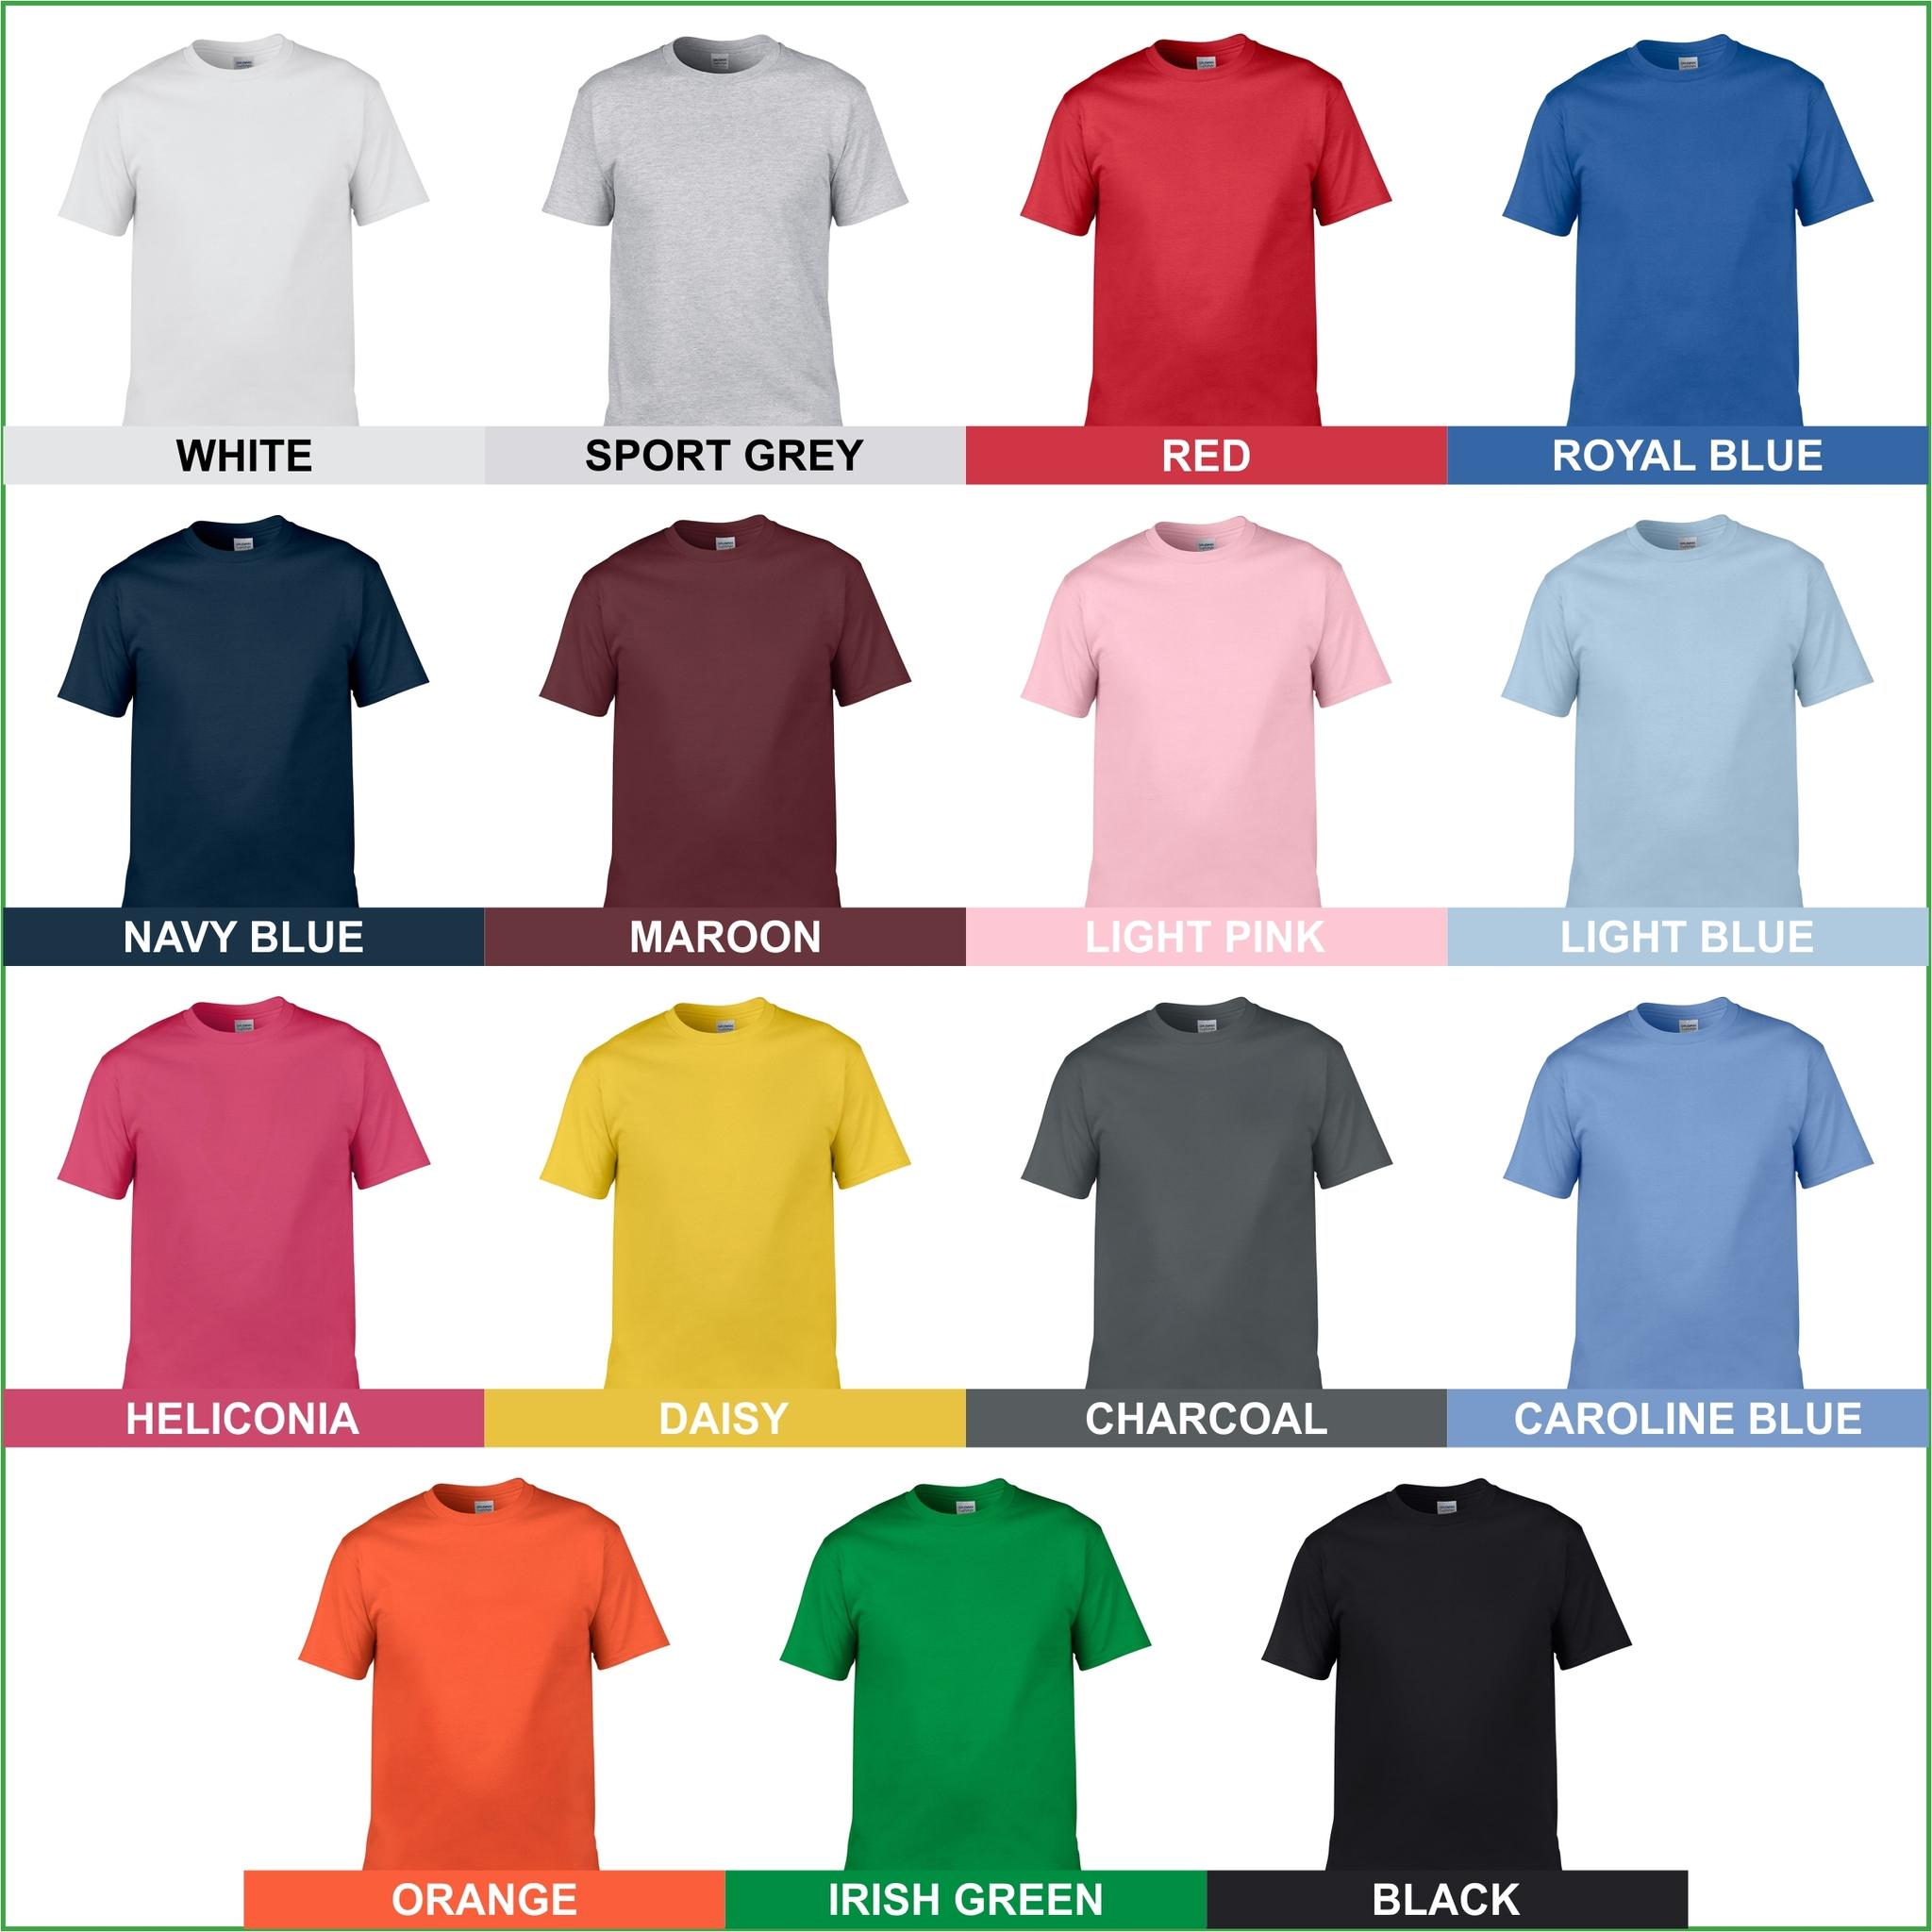 Promo Harga Kaos Polos Grey Misty Update 2018 Orange Triton Pecah Pola Maroon 3tone Pendek 30s Daftar Jual Cotton Combed Kualitas Distro